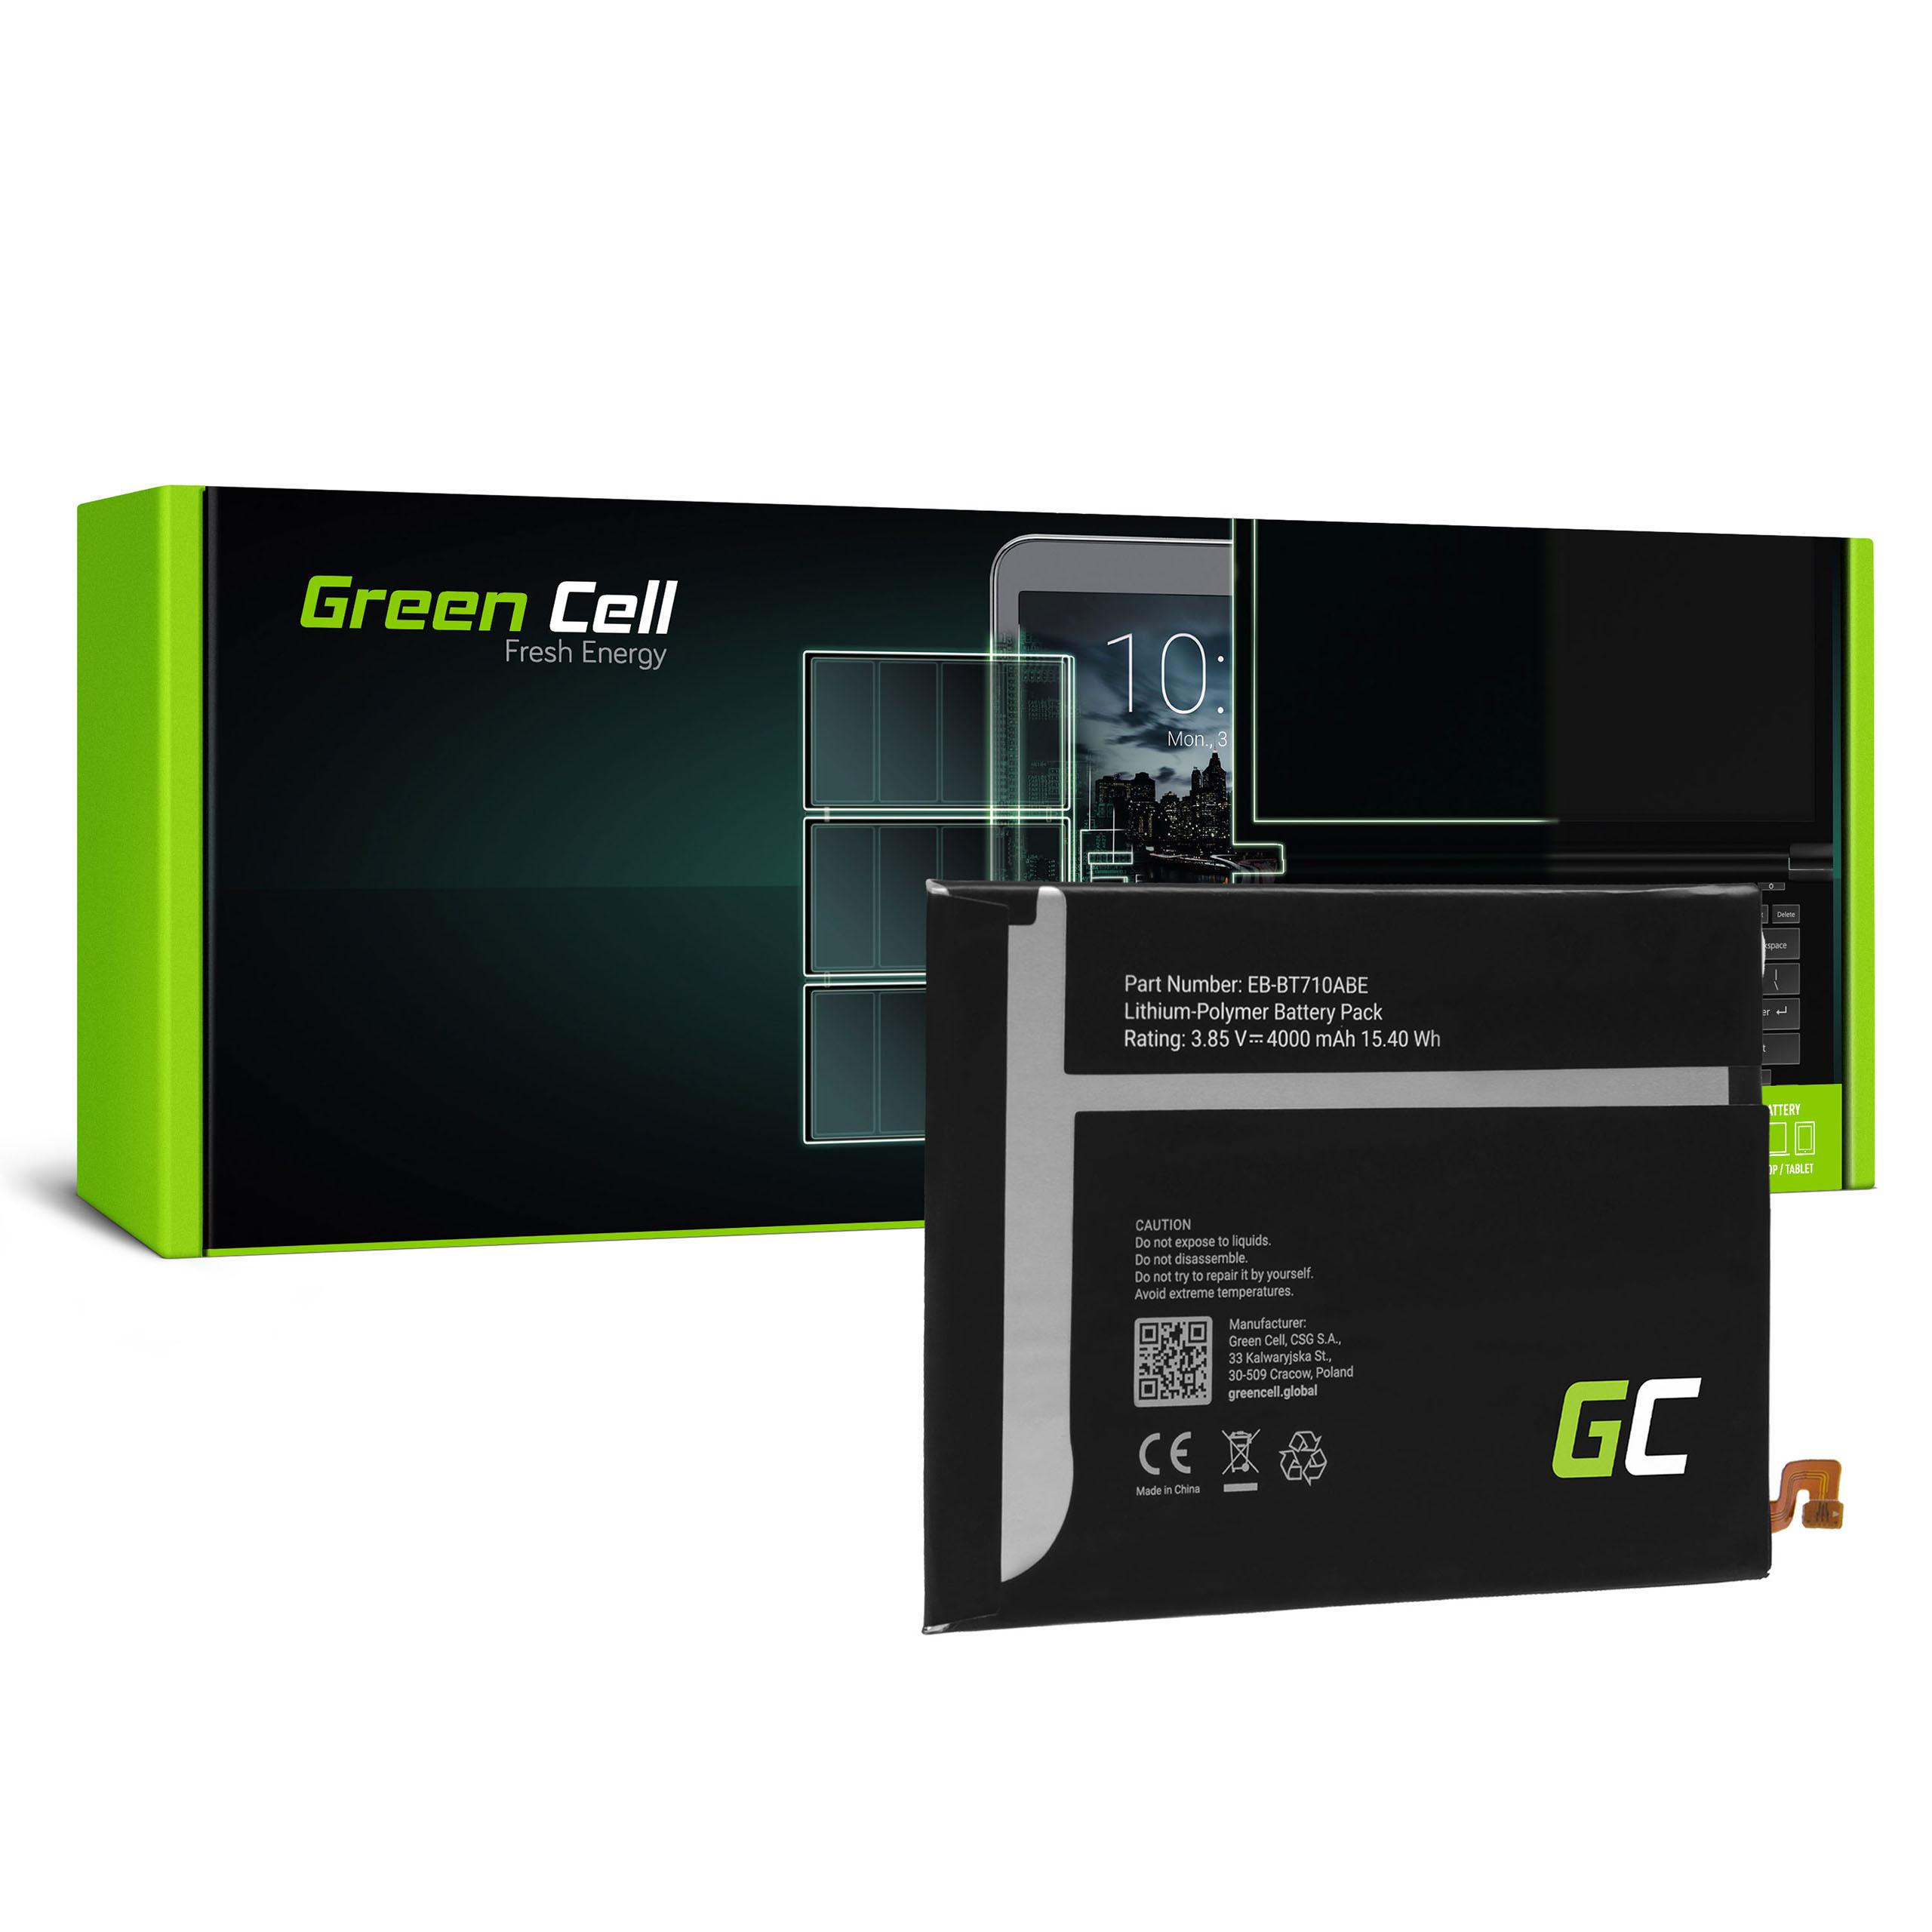 Battery EB-BT710ABE EB-BT710ABA for Samsung Galaxy Tab S2 8.0 T710 T715 T719 T719N